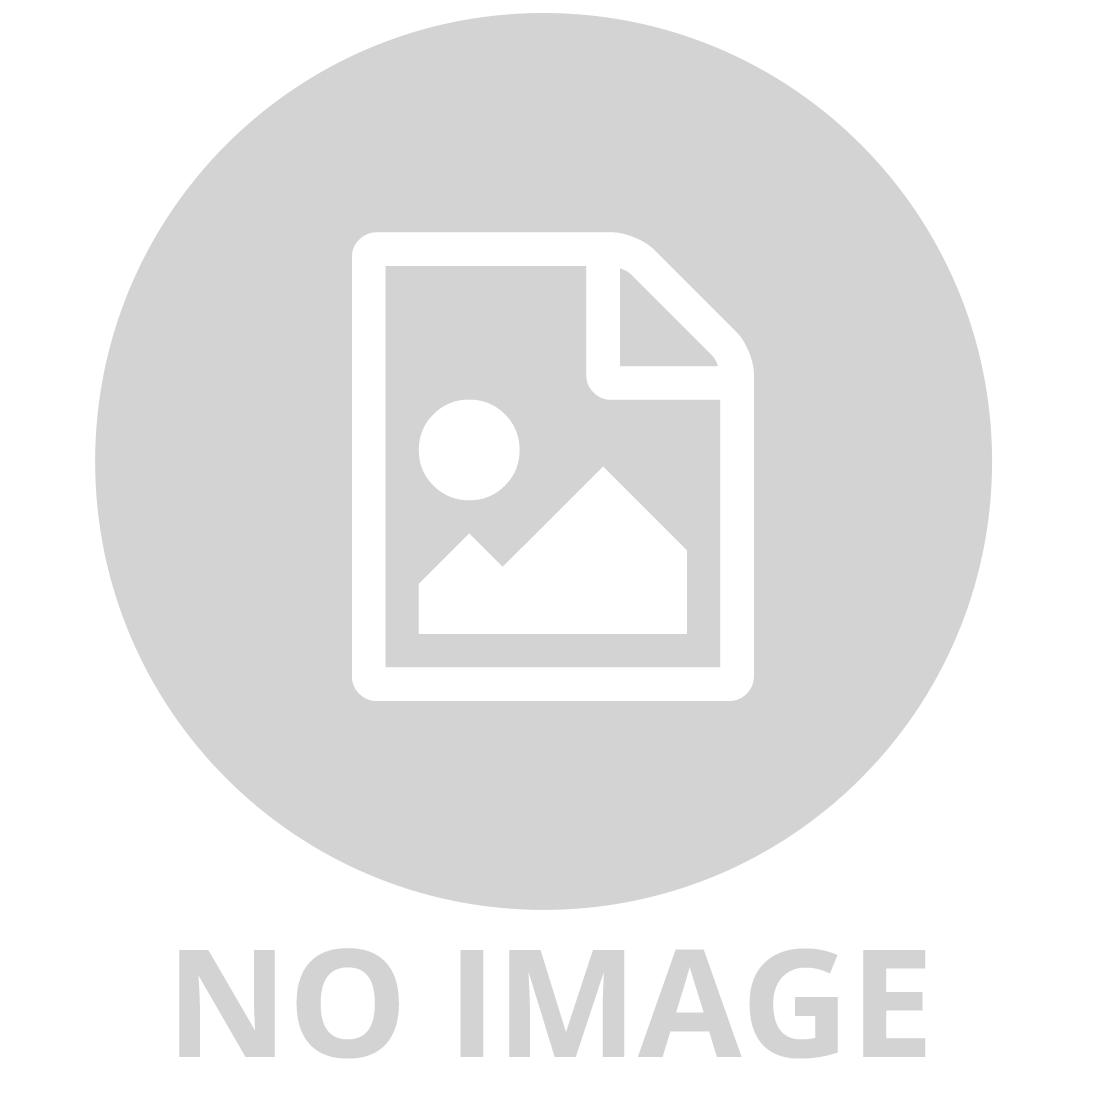 LEGO CITY- JUNGLE STARTER SET 60157